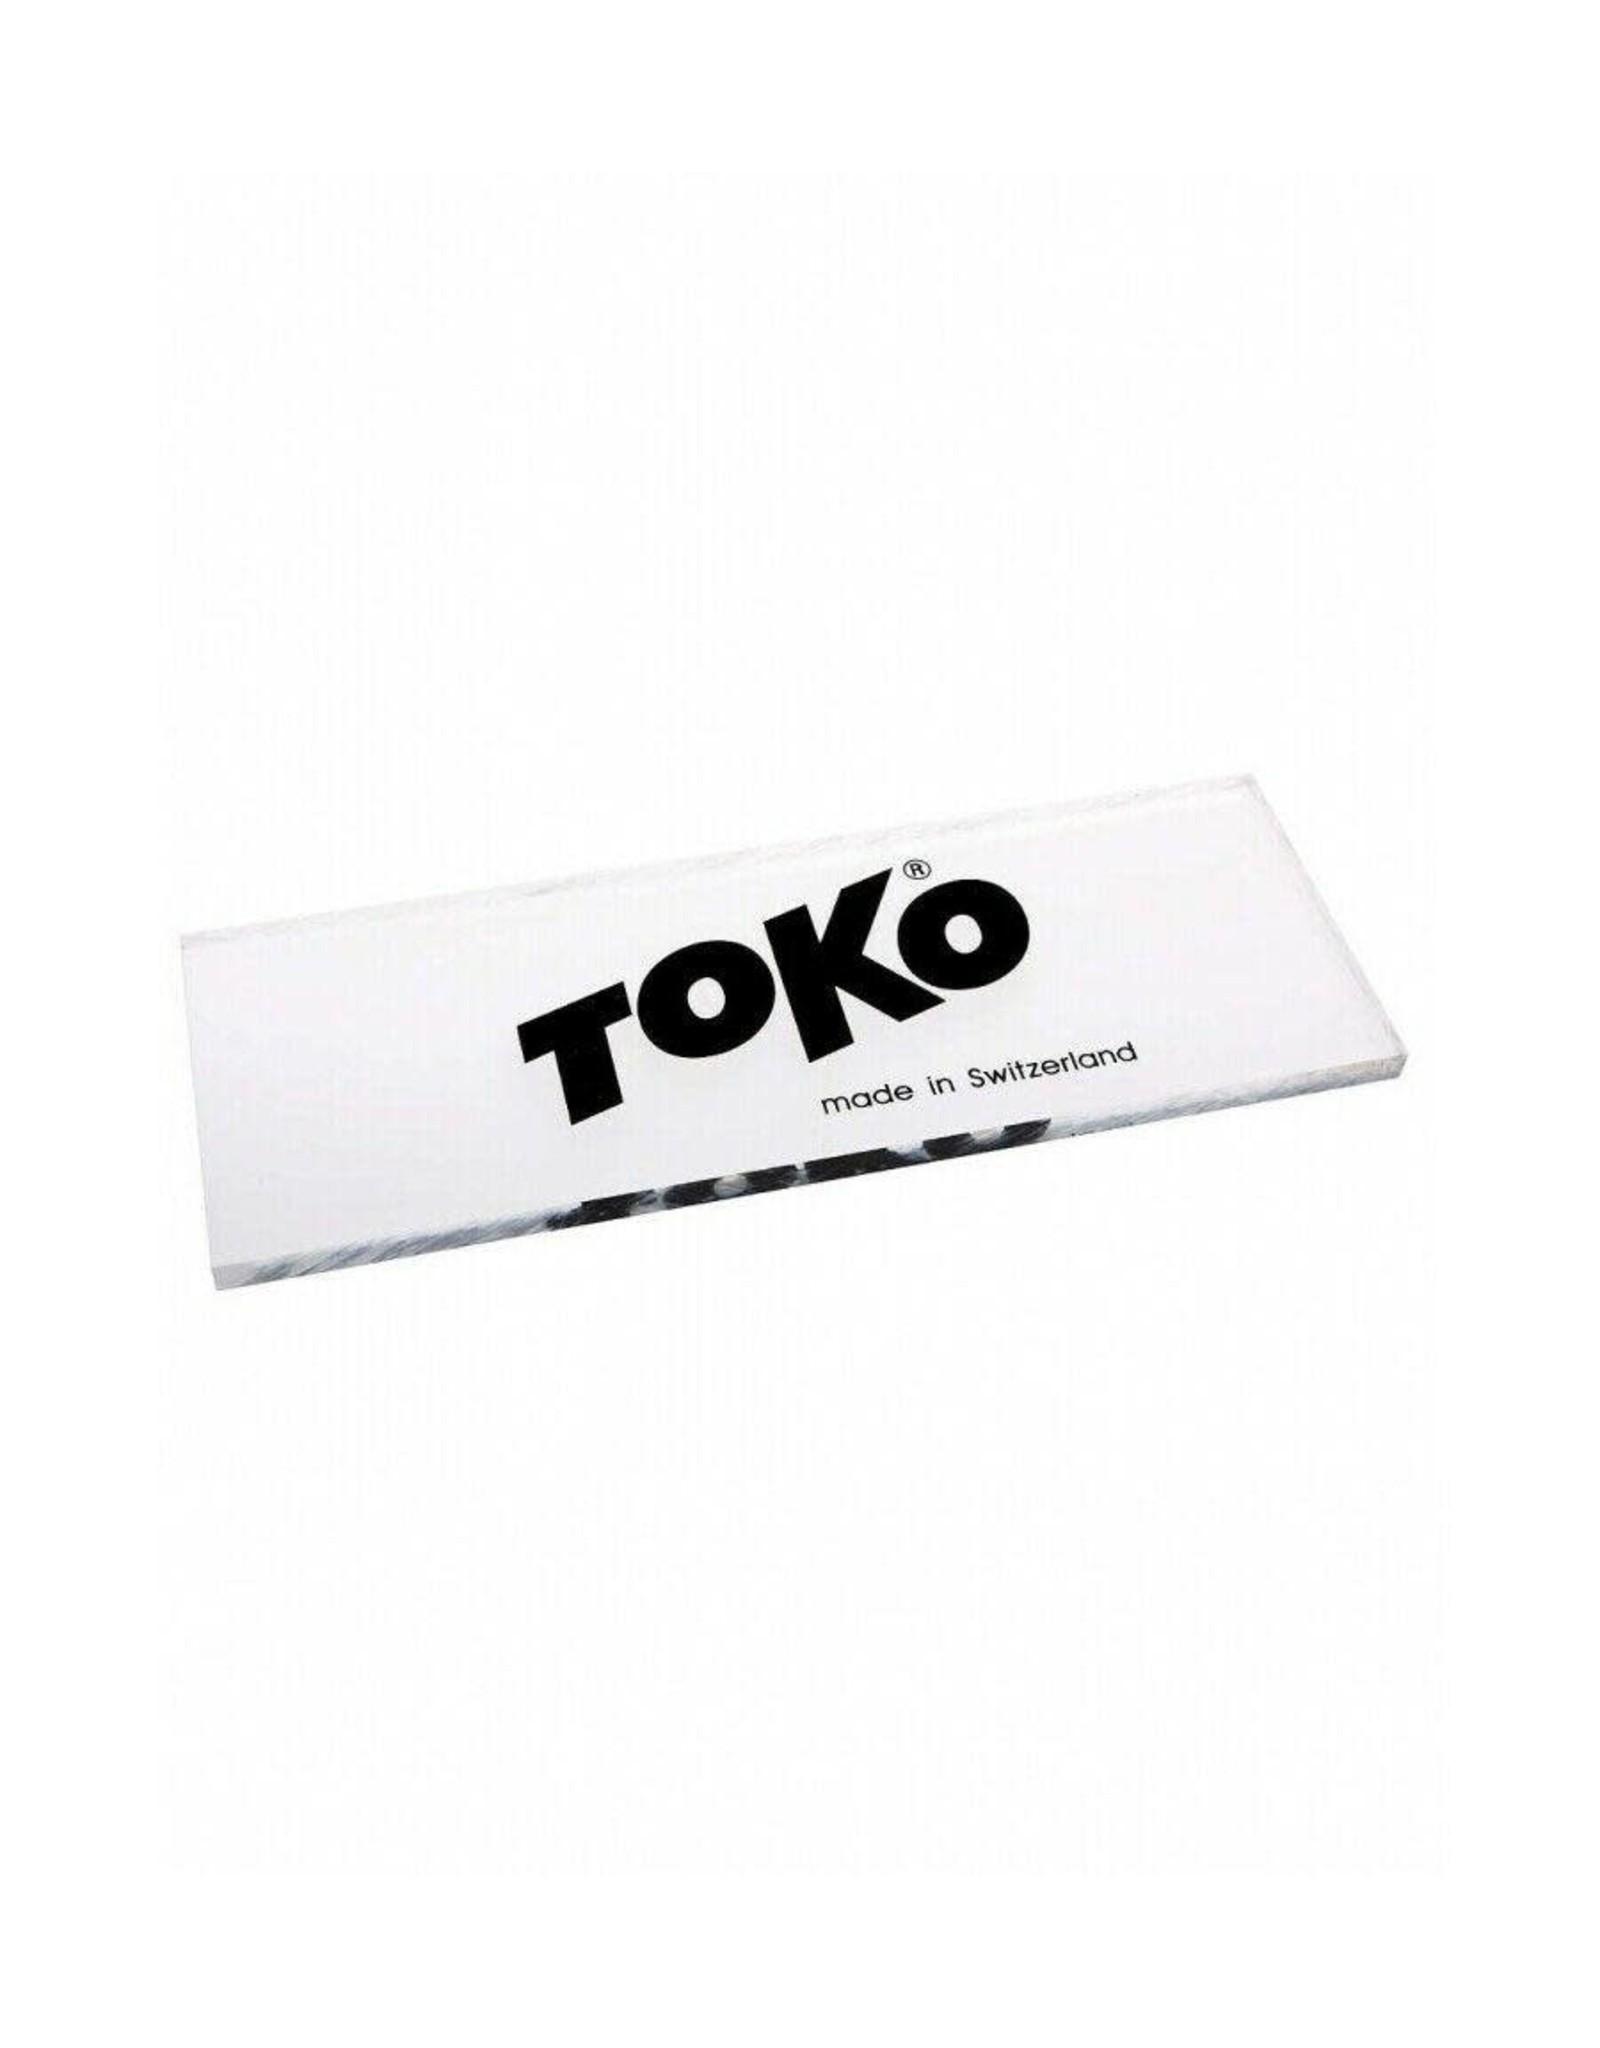 Toko Toko Plexi Scraper Backshop